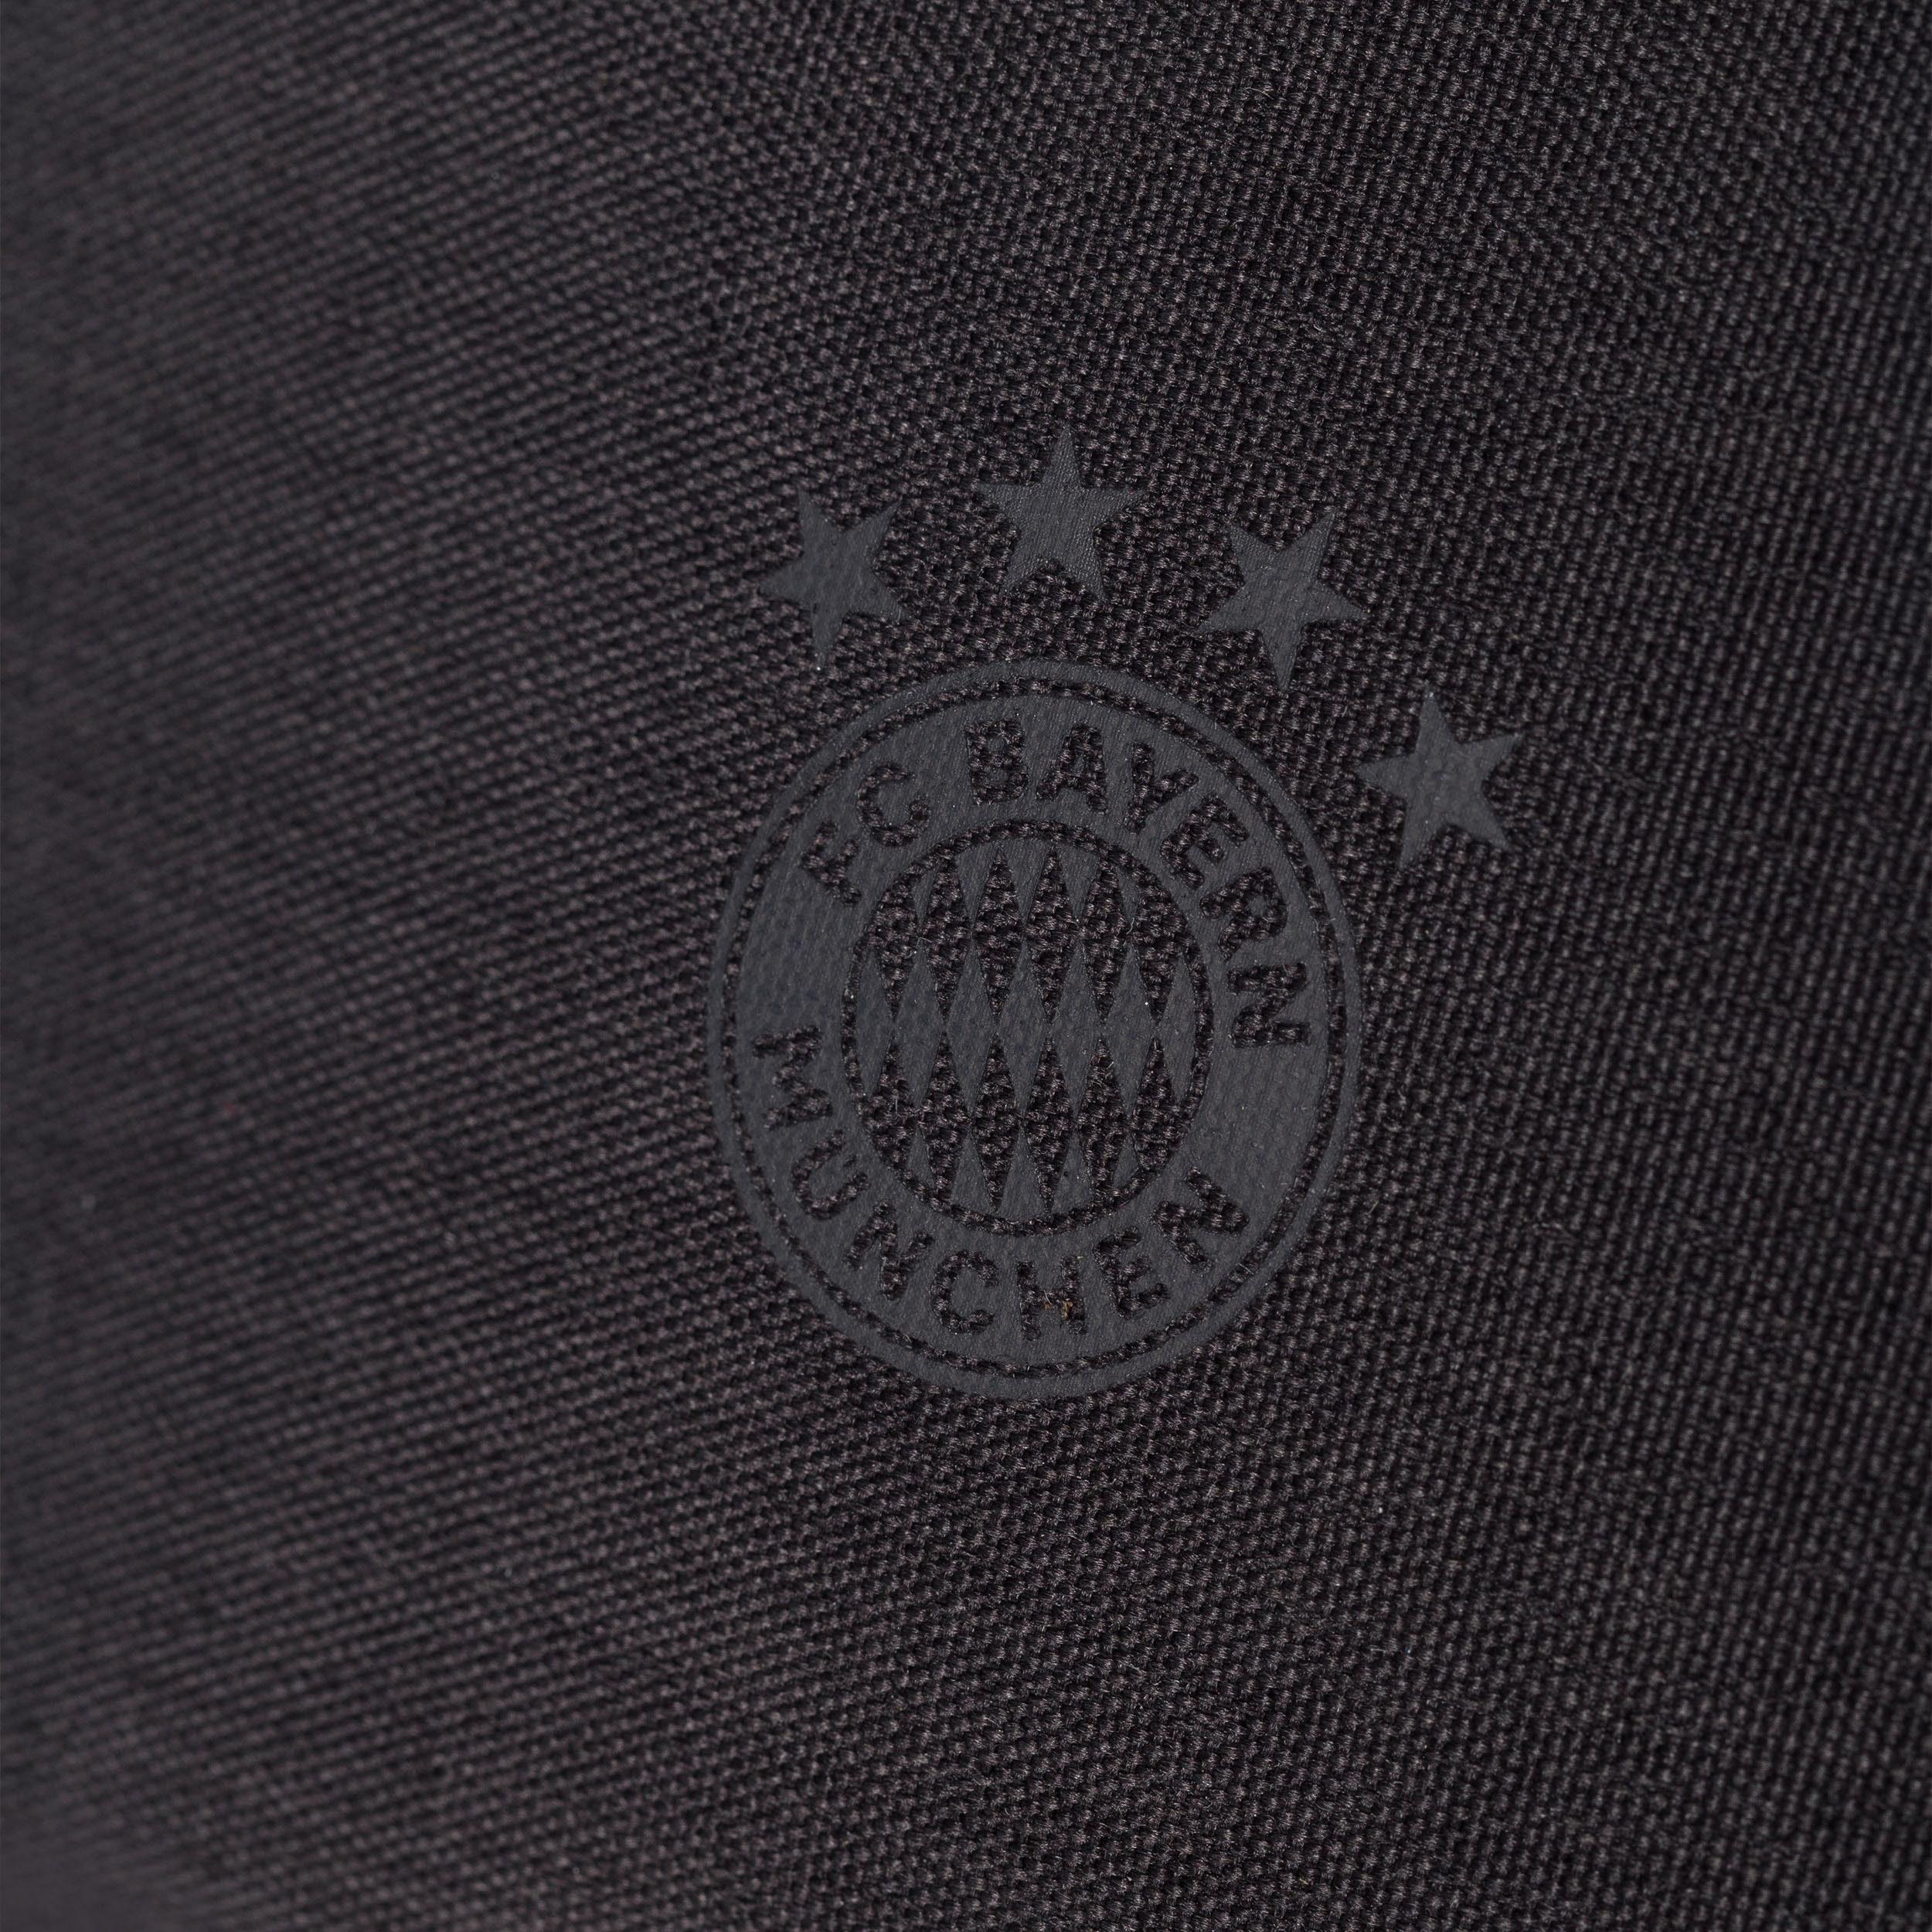 Fc »fcbAnthrazit« Gürteltasche »fcbAnthrazit« Fc Kaufen Bayern Bayern Gürteltasche dorBeCx